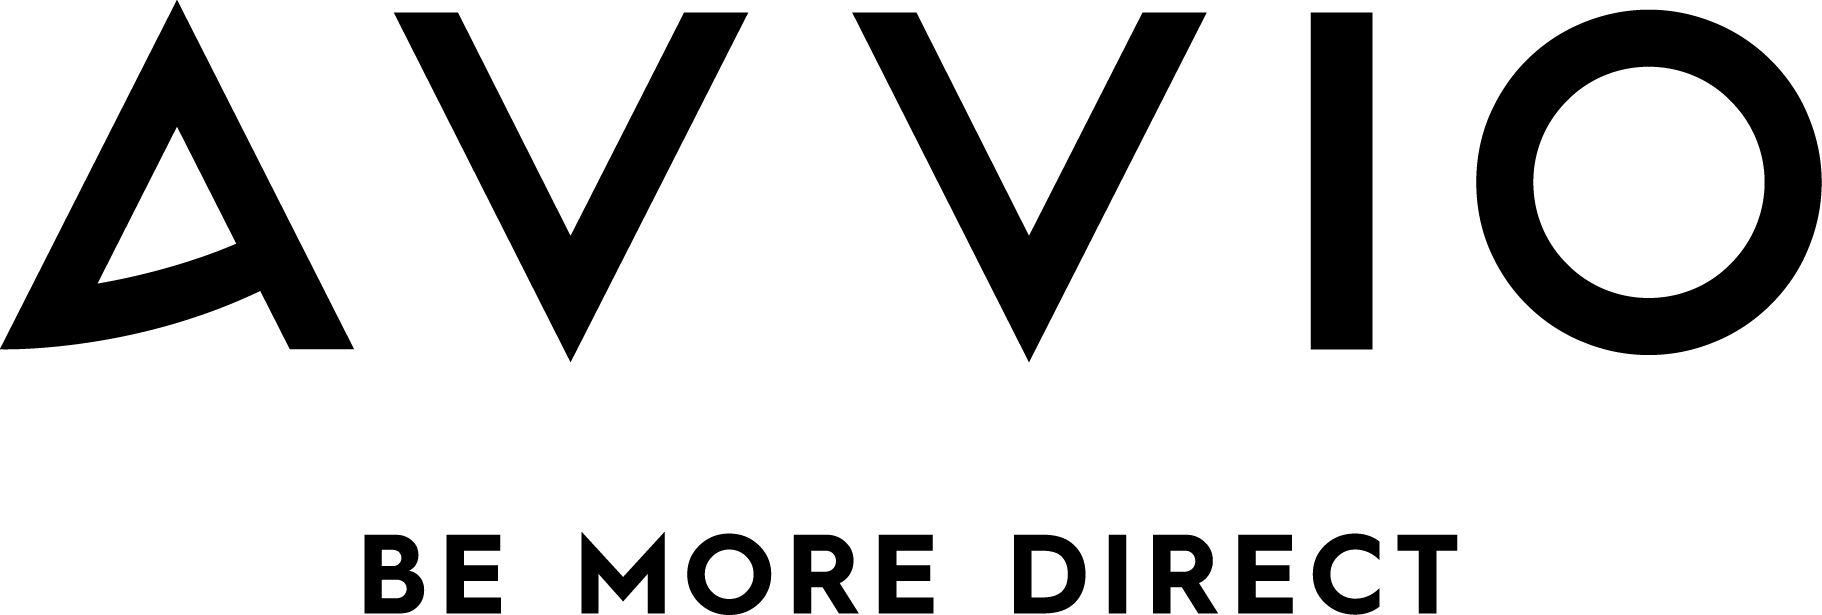 Avvio-Logo-Black-Tagline (002).jpg